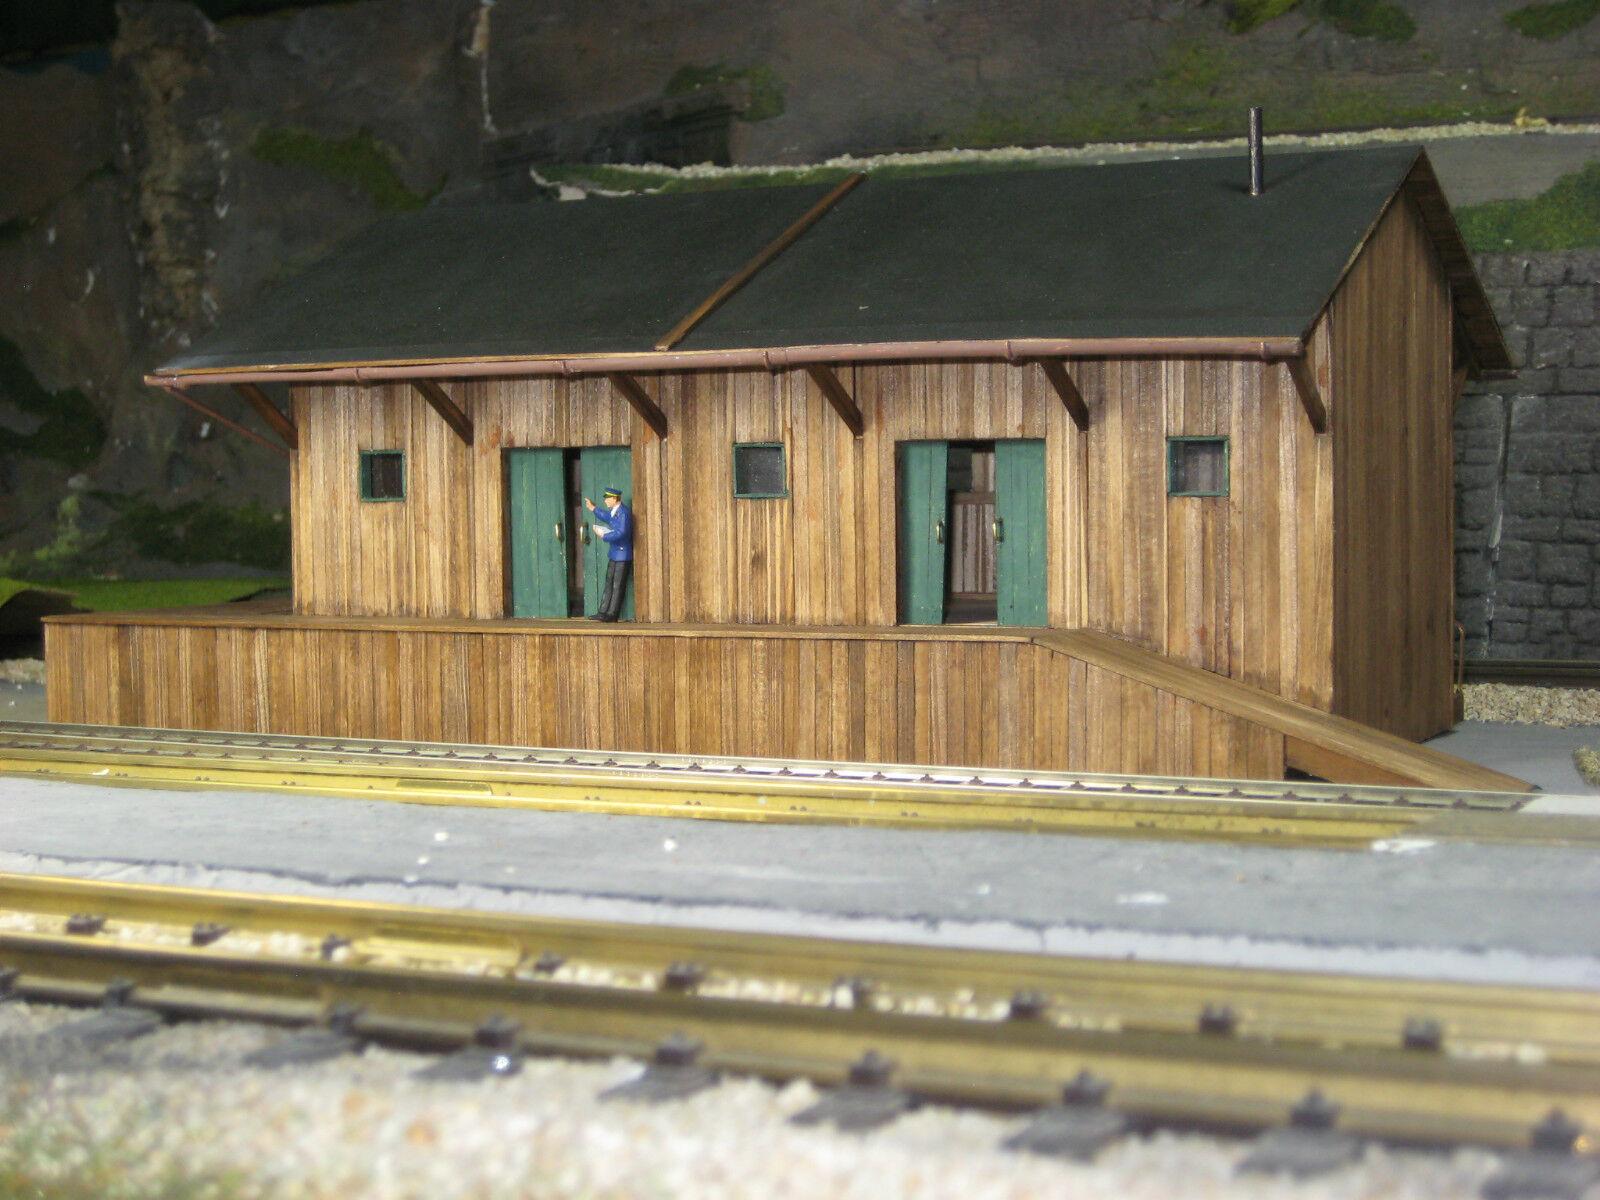 44990 G - Güterabfertigung   Lagerhalle green im Maßstab 1 43 (Spur 0)